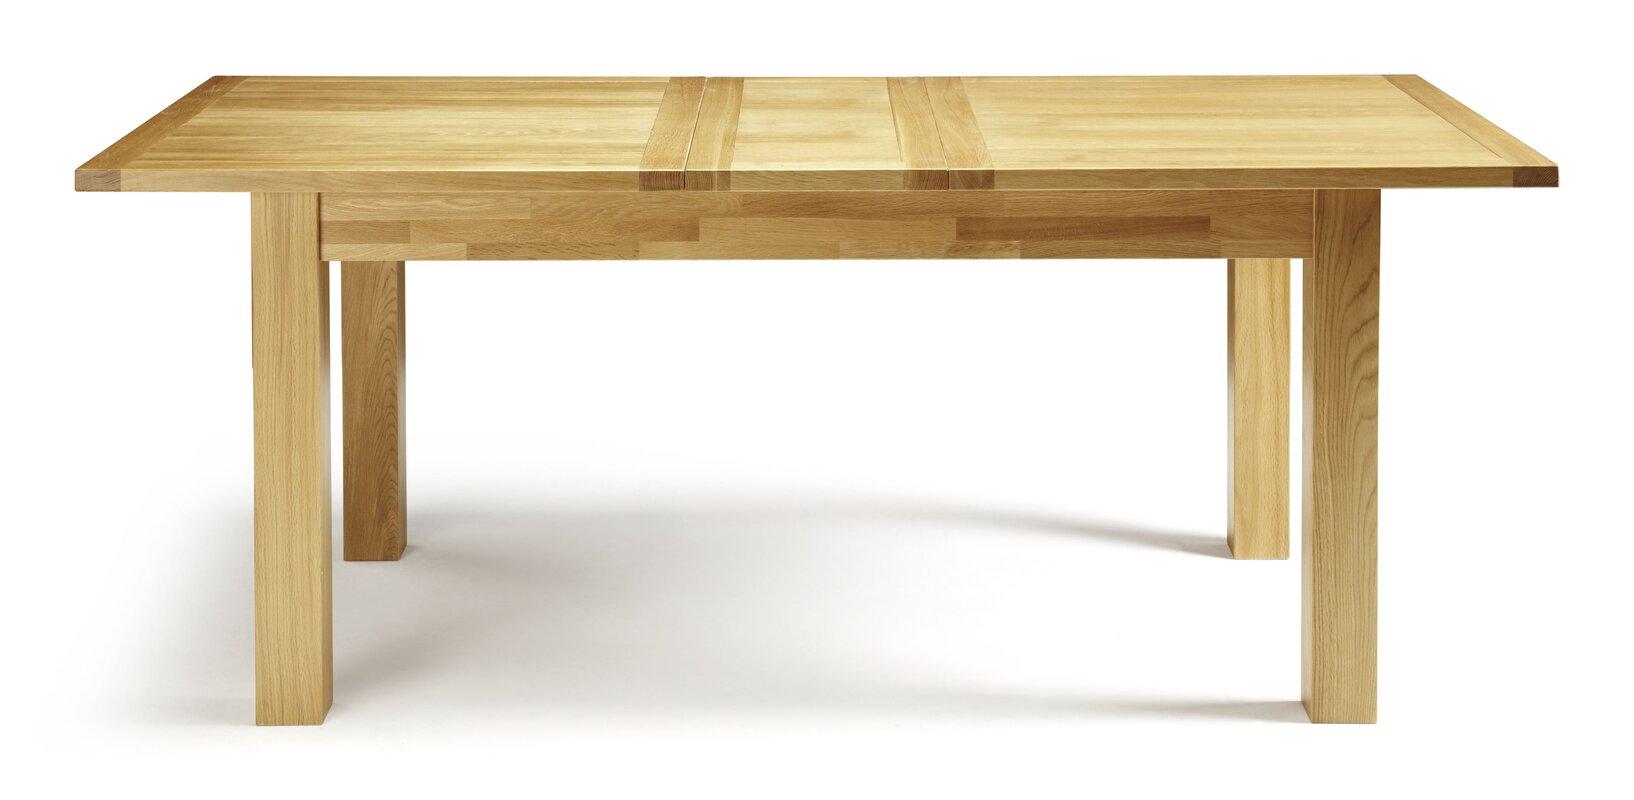 marlow home co essgruppe davidson mit 6 st hlen bewertungen. Black Bedroom Furniture Sets. Home Design Ideas